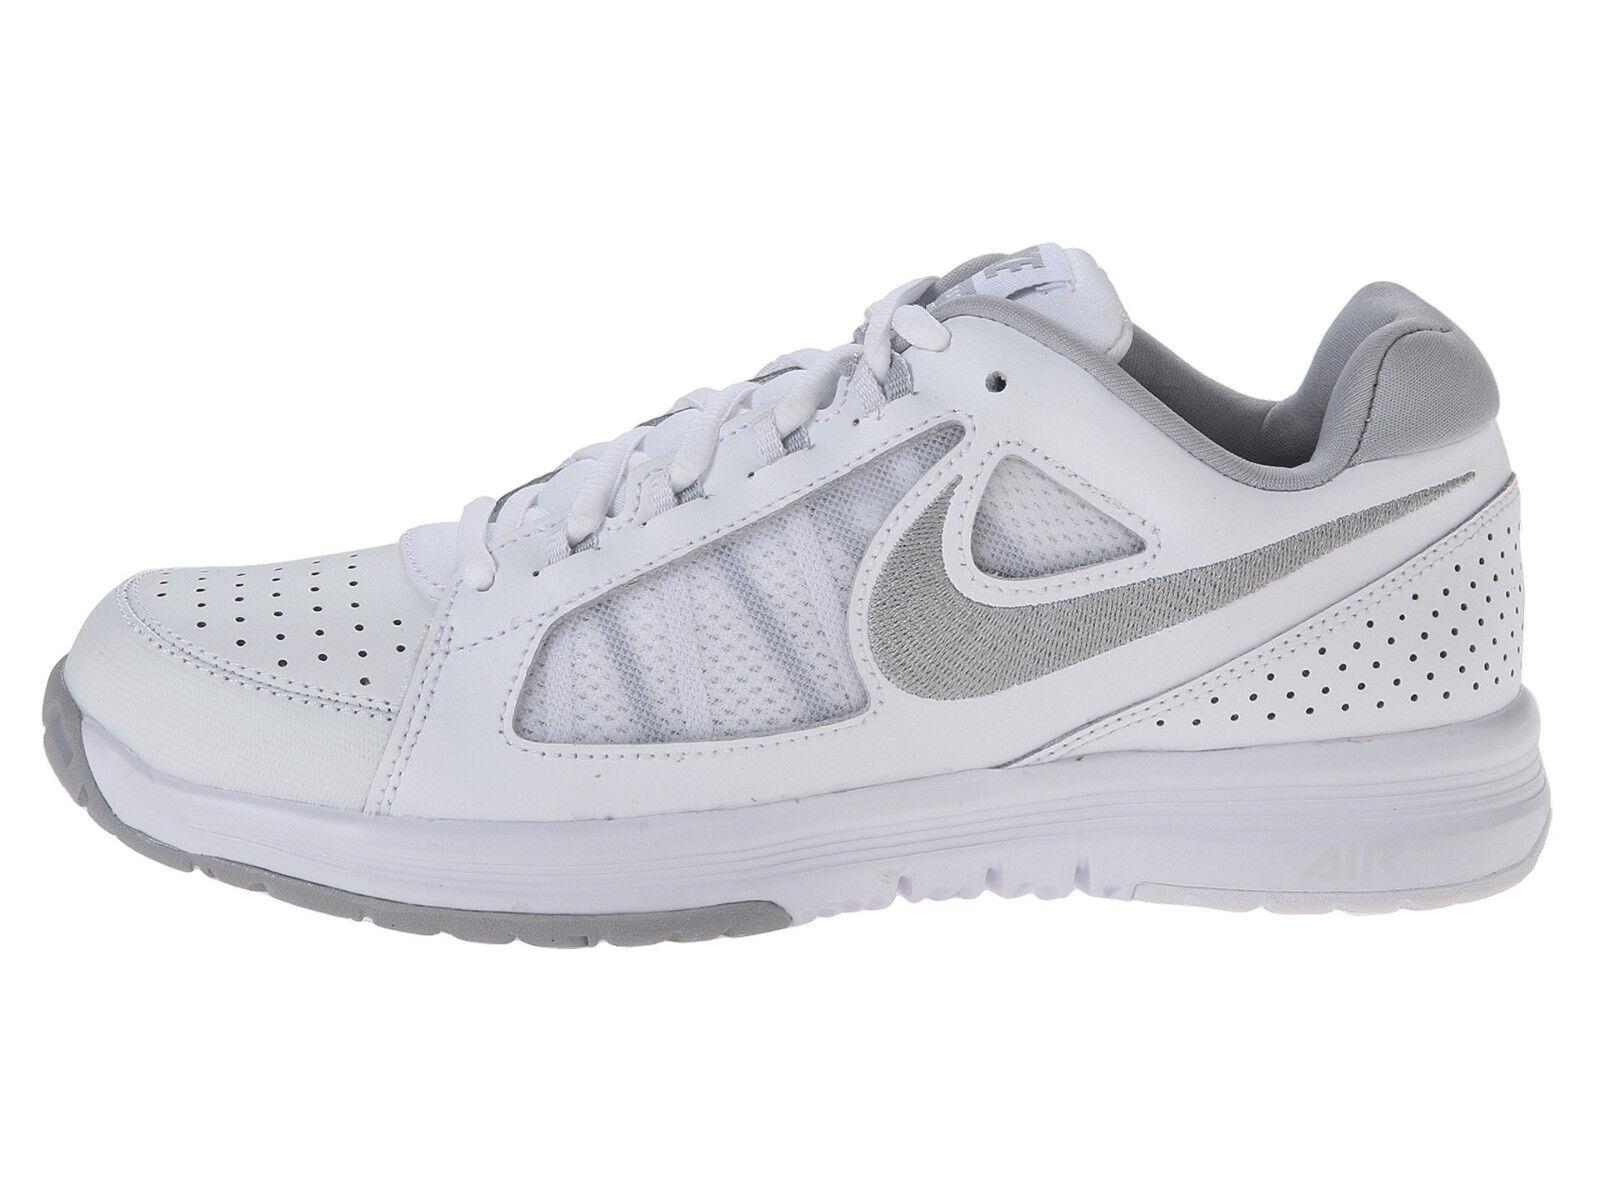 Donna, nike air vapore ace scarpe da tennis bianco argento metallico gray 8 10 11 12